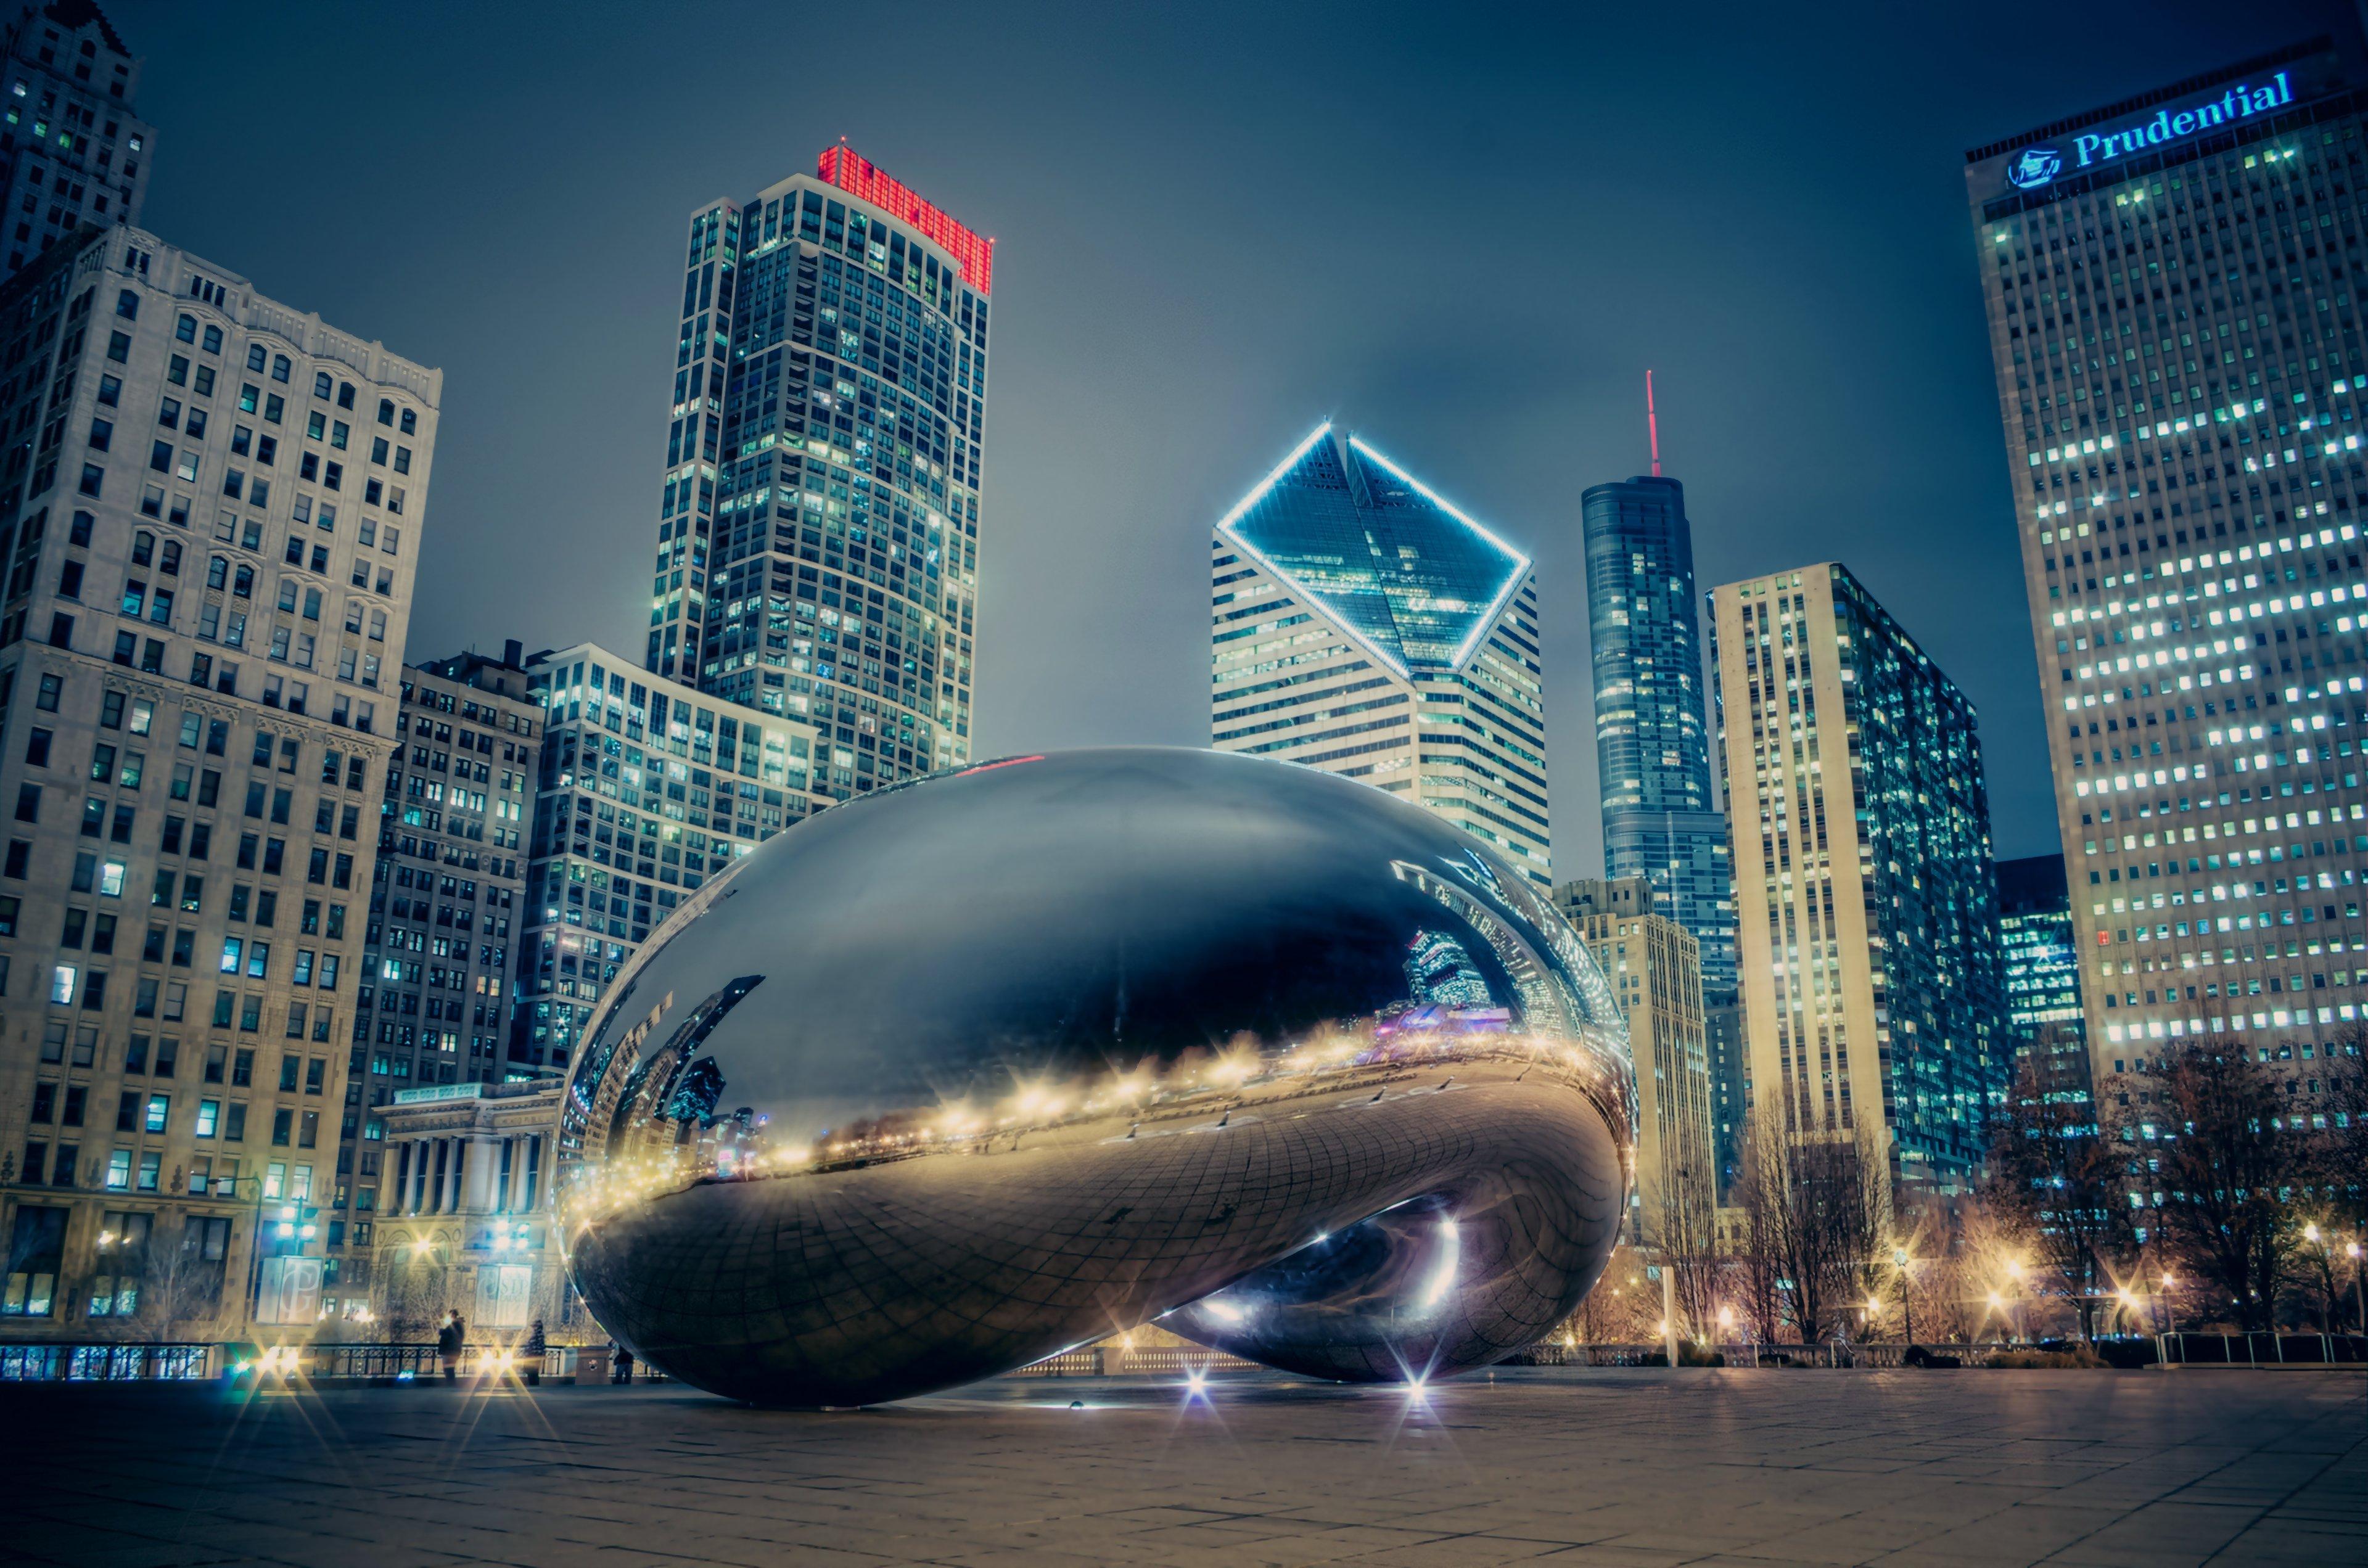 Good Wallpaper Night Chicago - 67ee09eeb1cbd775a844e9b42ceee5b3  Graphic.jpg